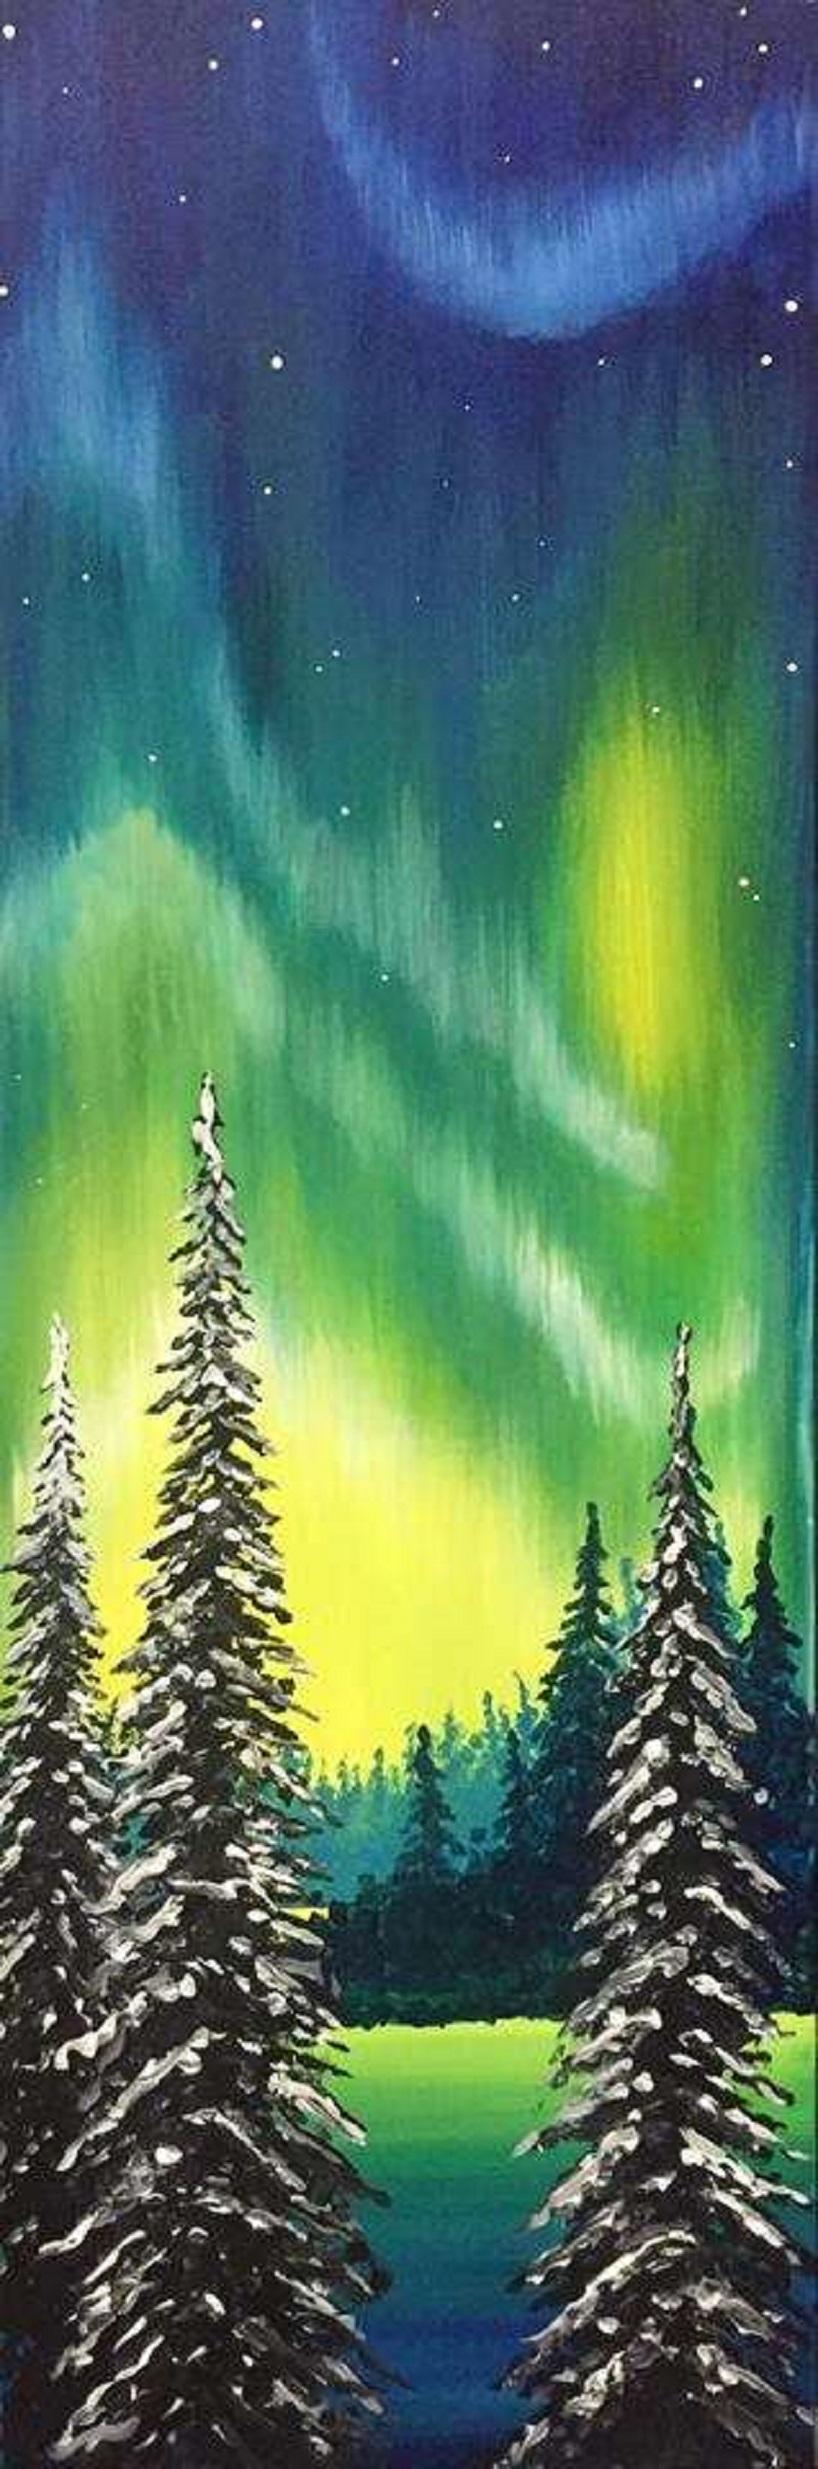 Winter Wonder - January 11